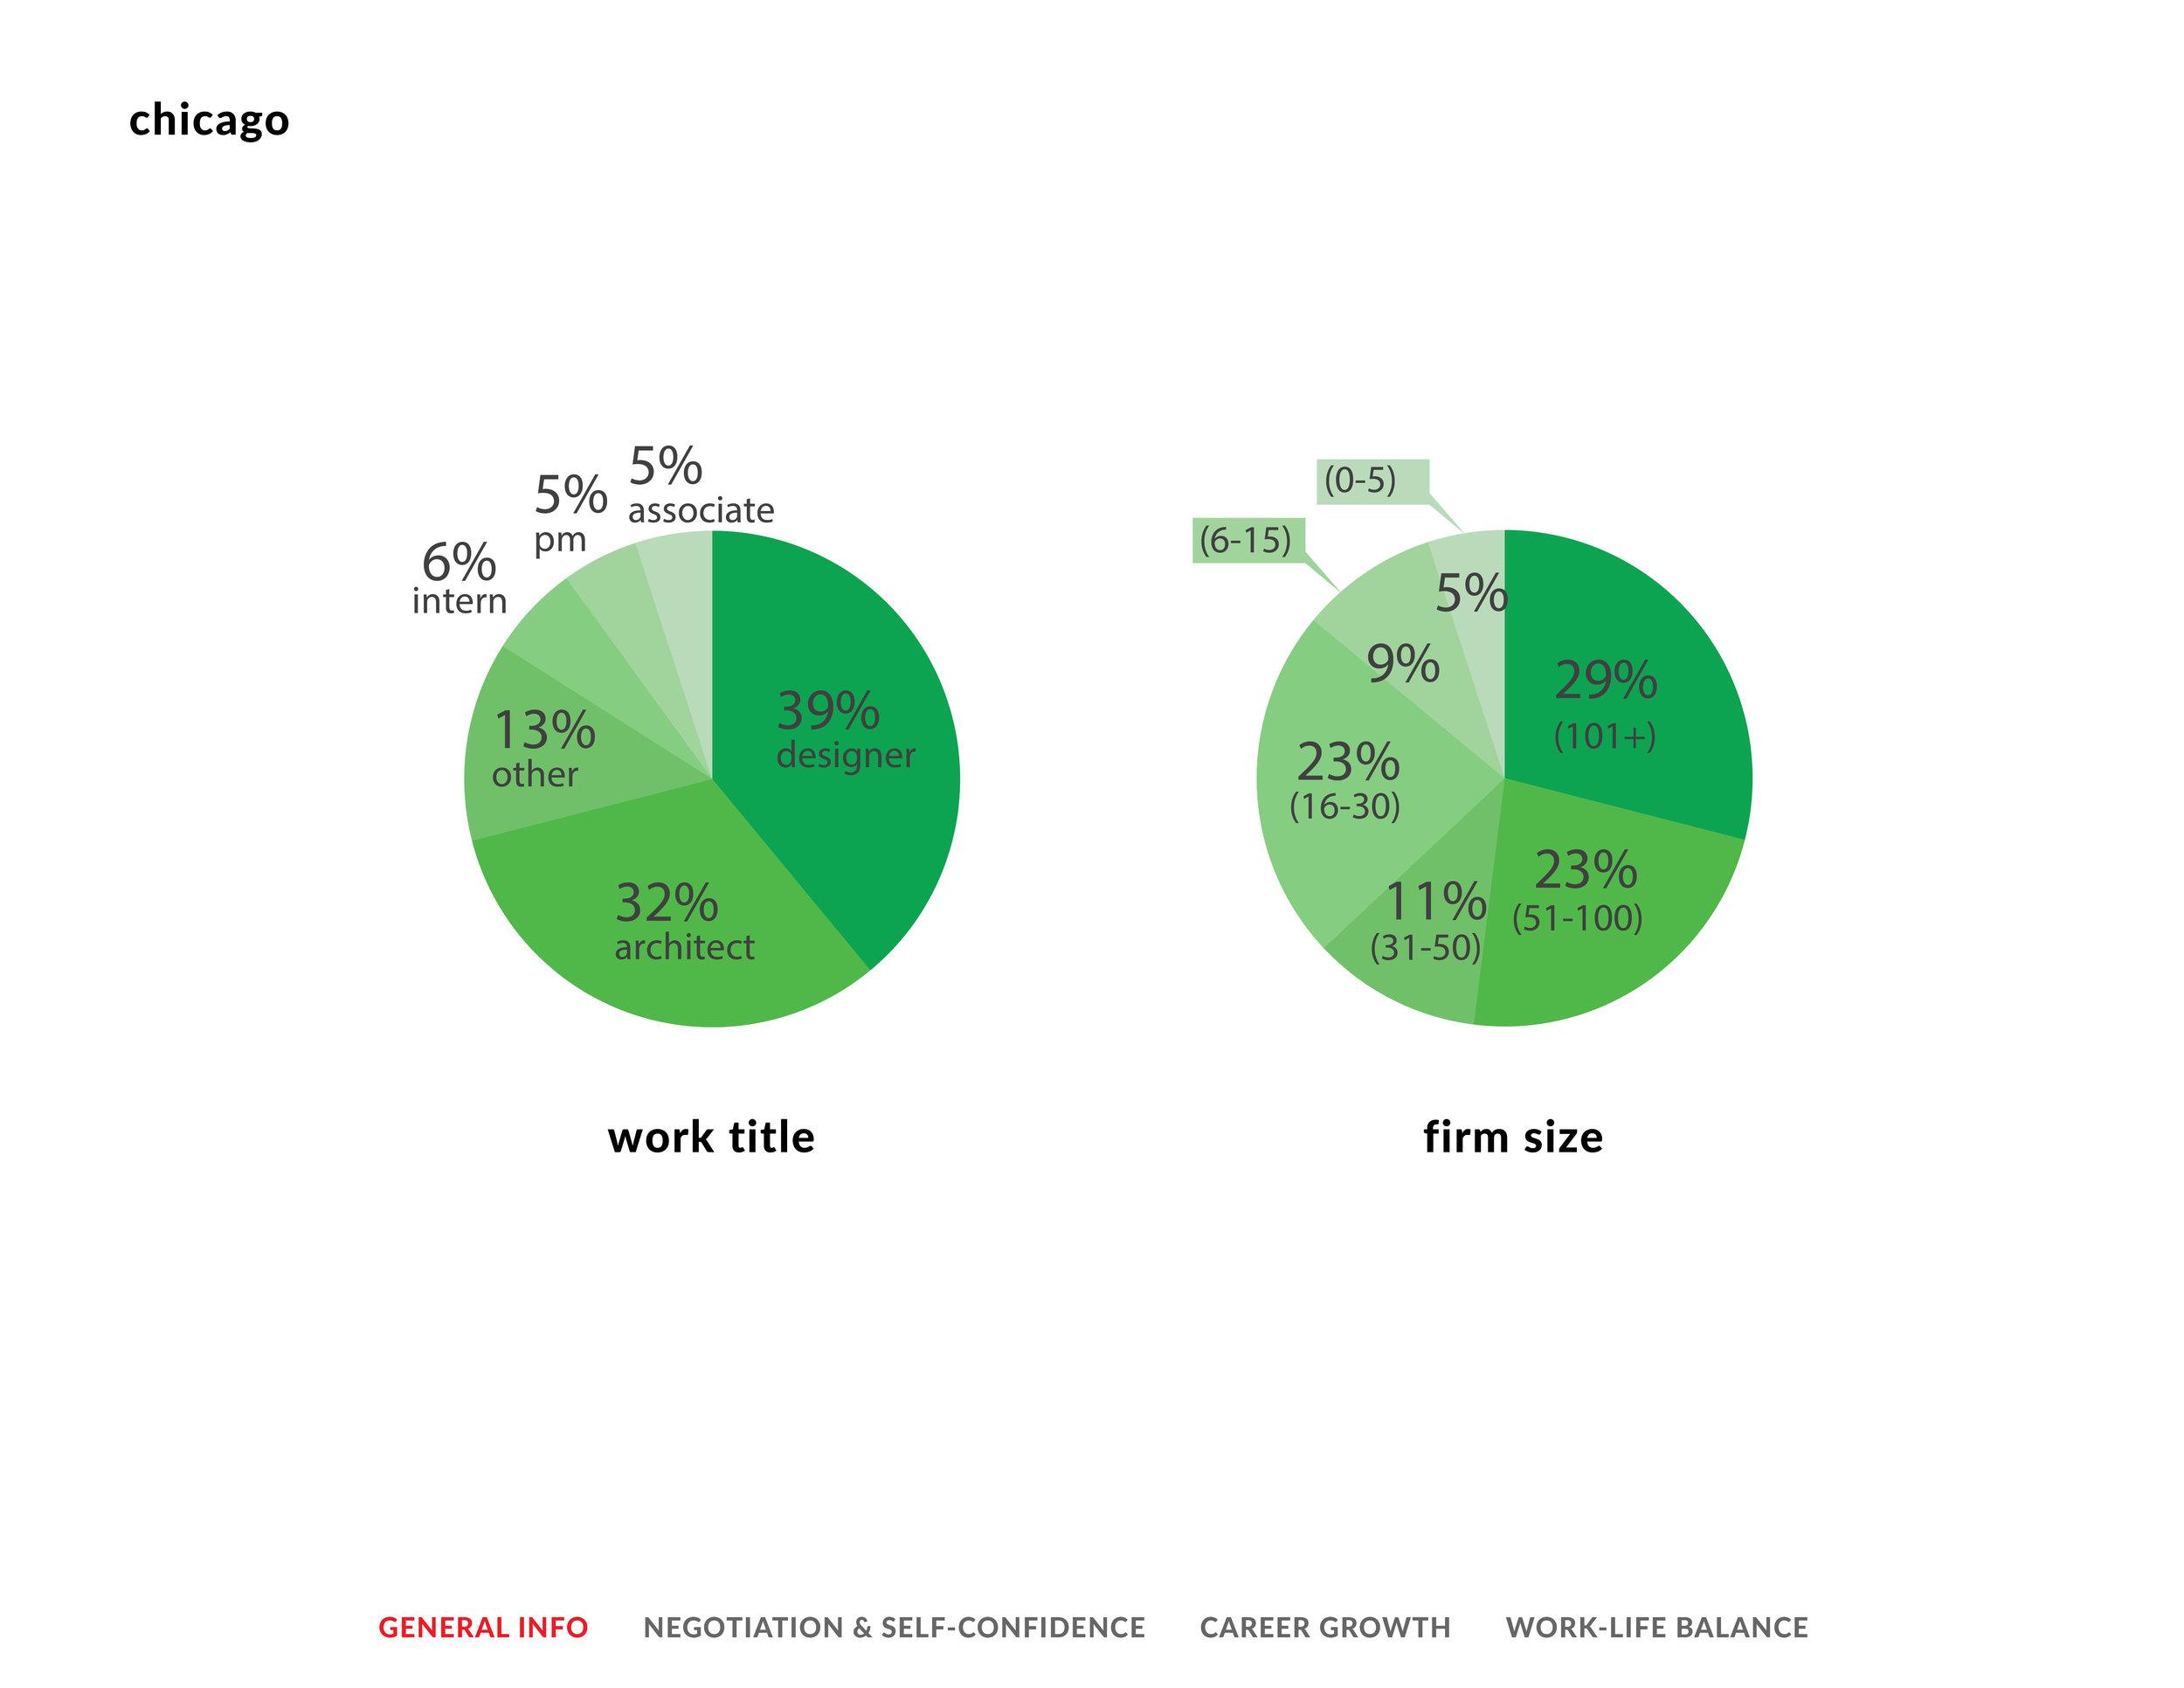 survey results92.jpg